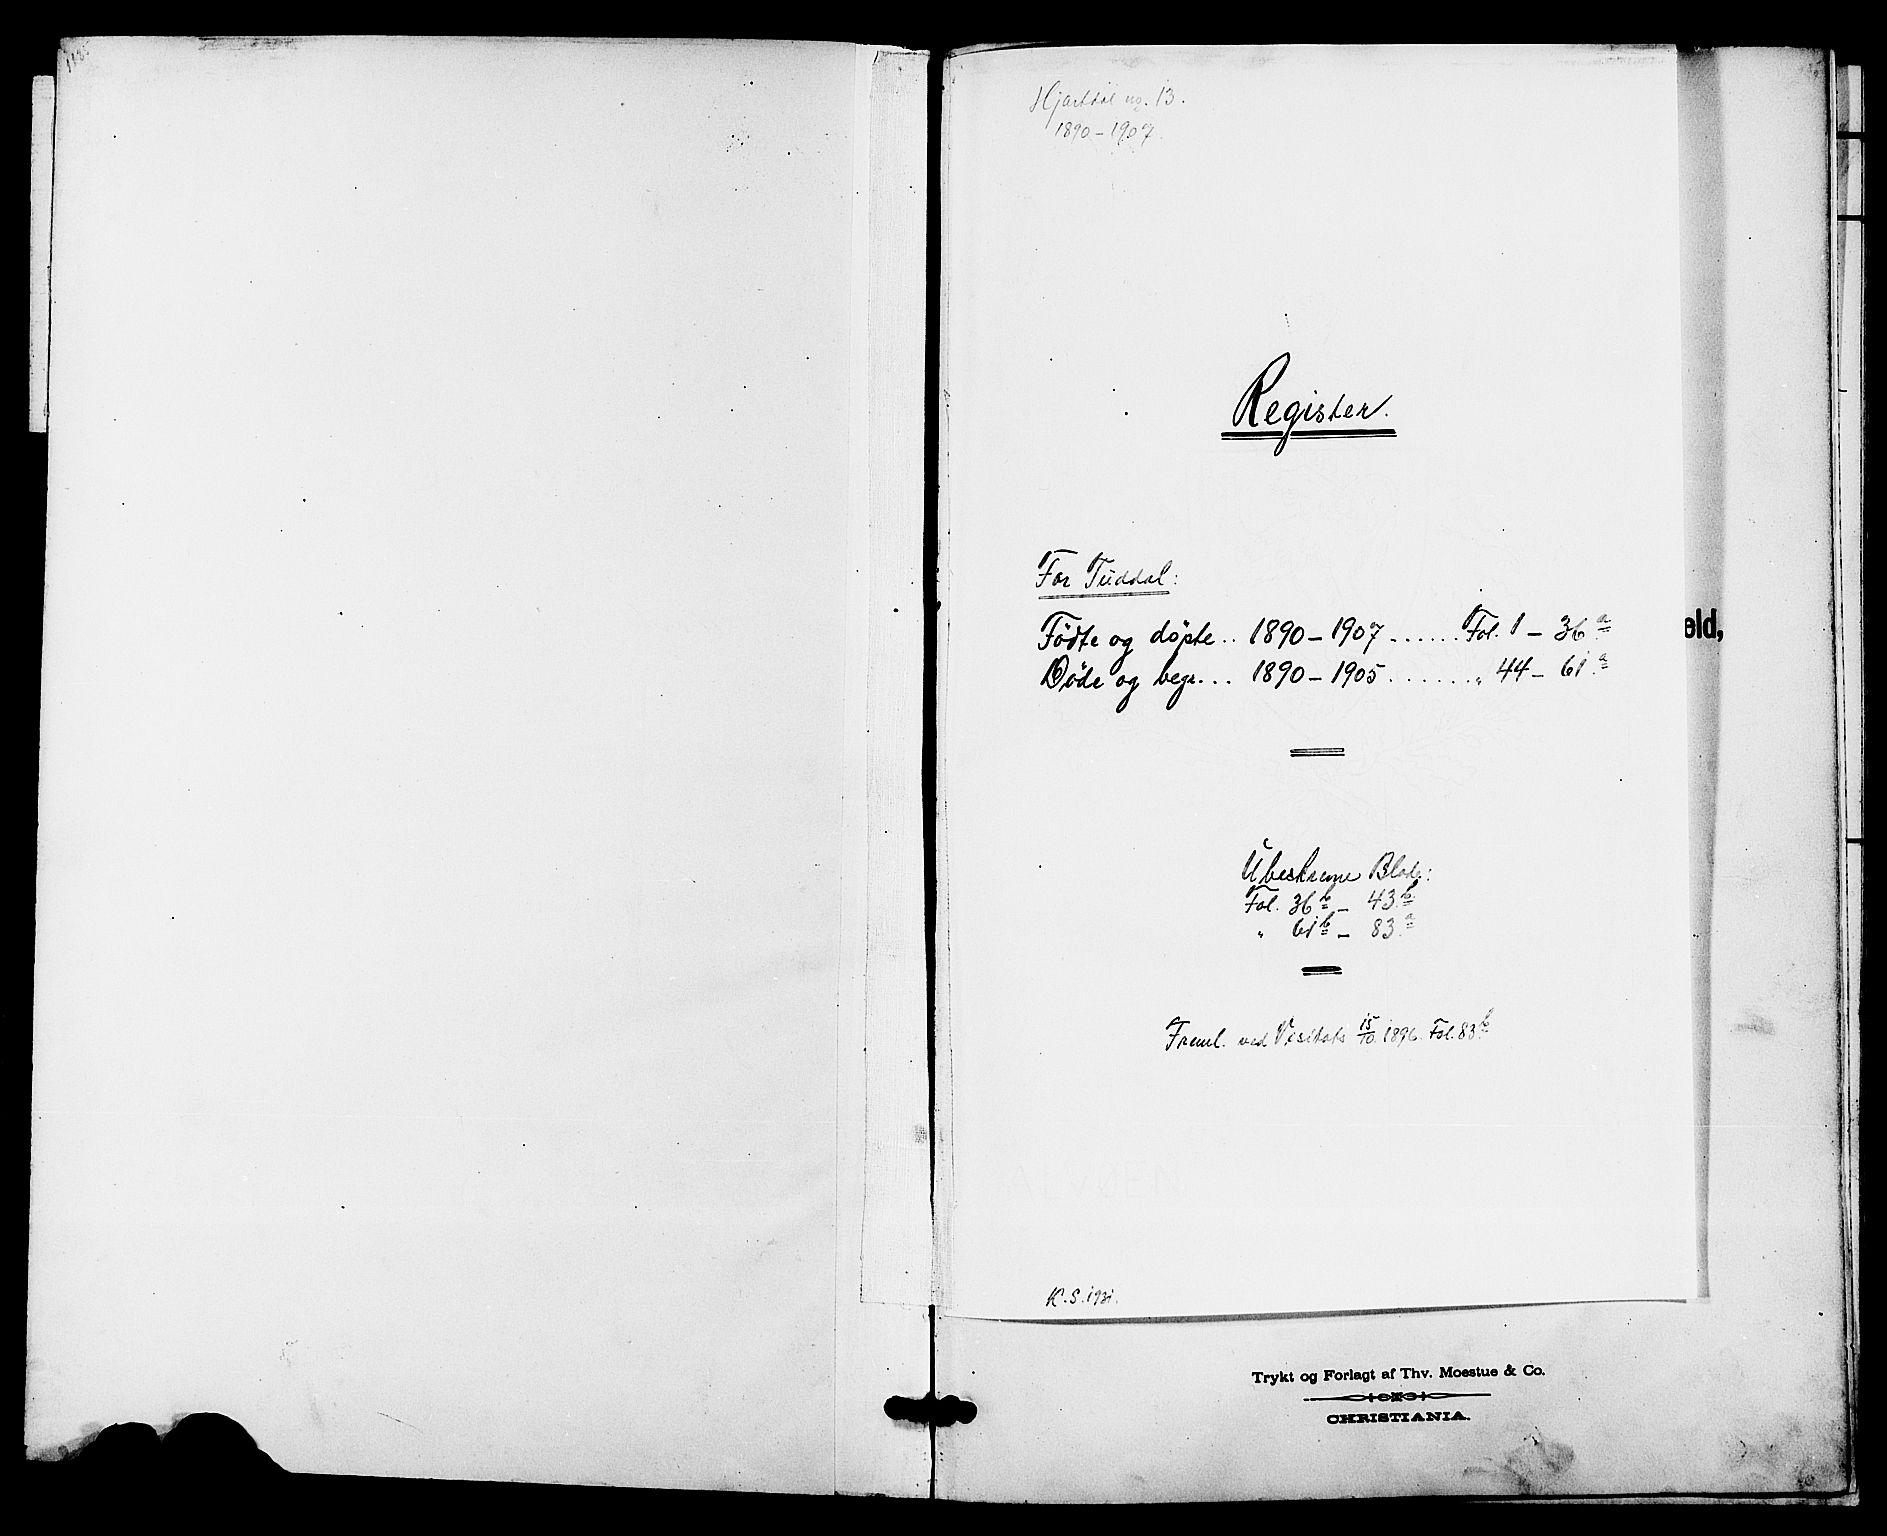 SAKO, Hjartdal kirkebøker, G/Gc/L0003: Klokkerbok nr. III 3, 1890-1907